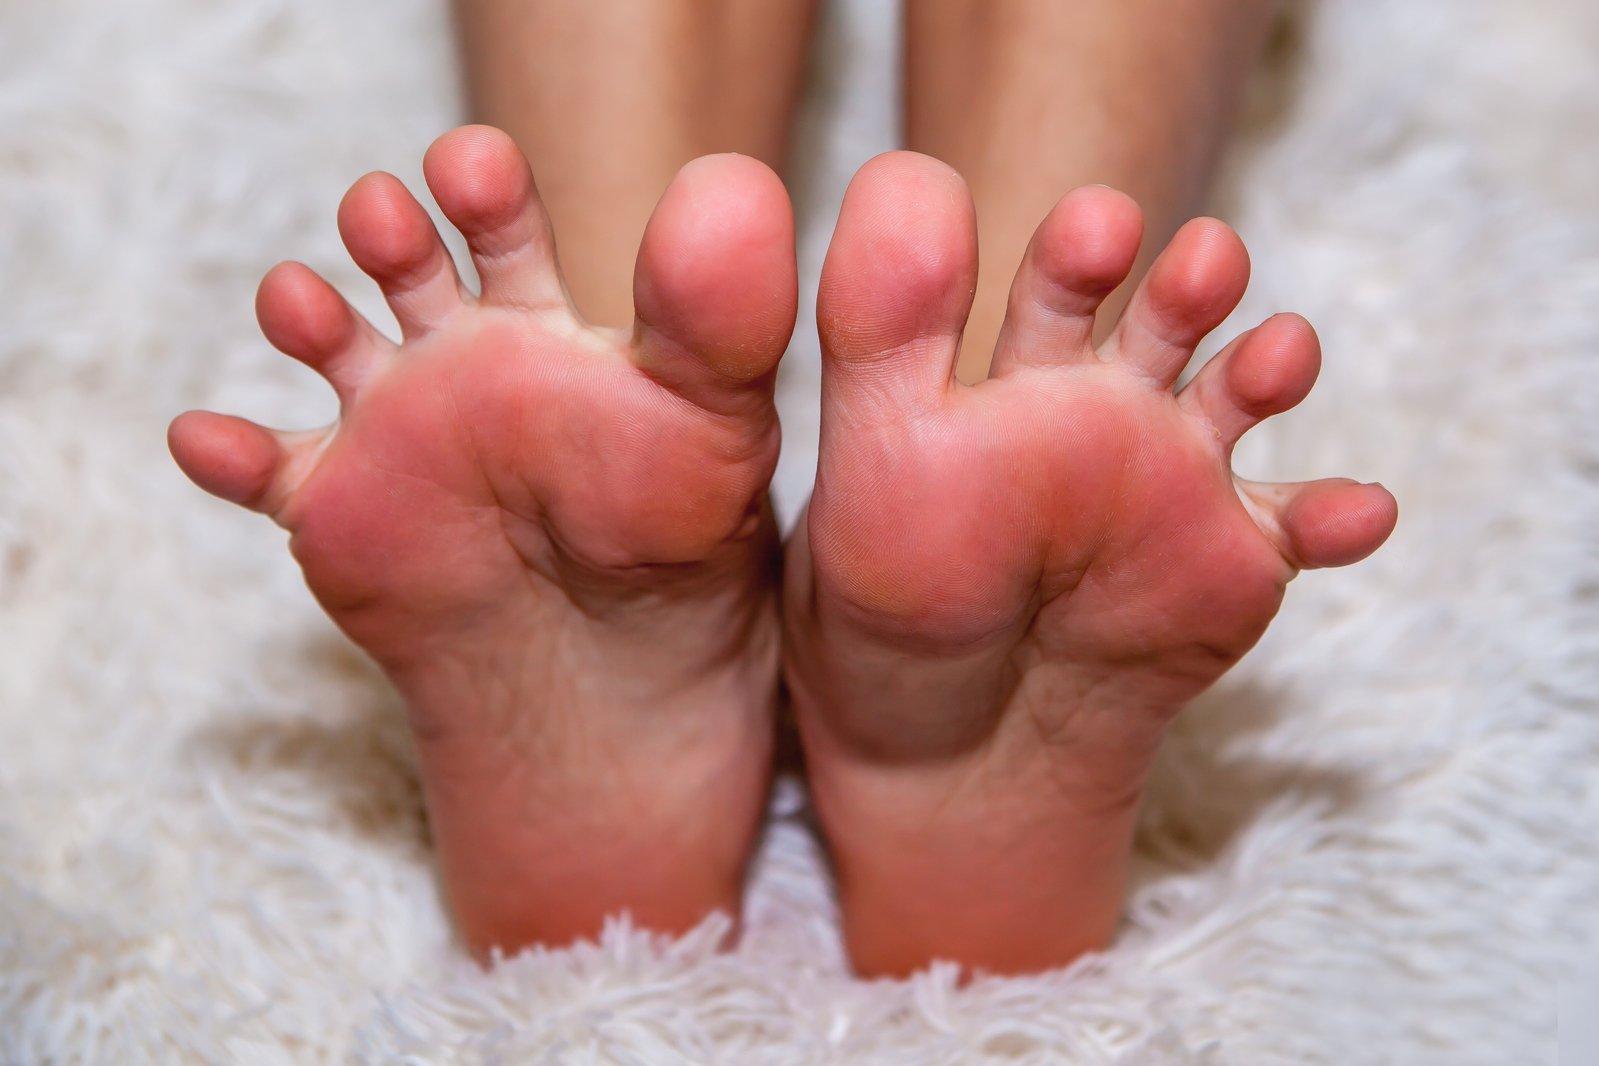 pics Bare feet